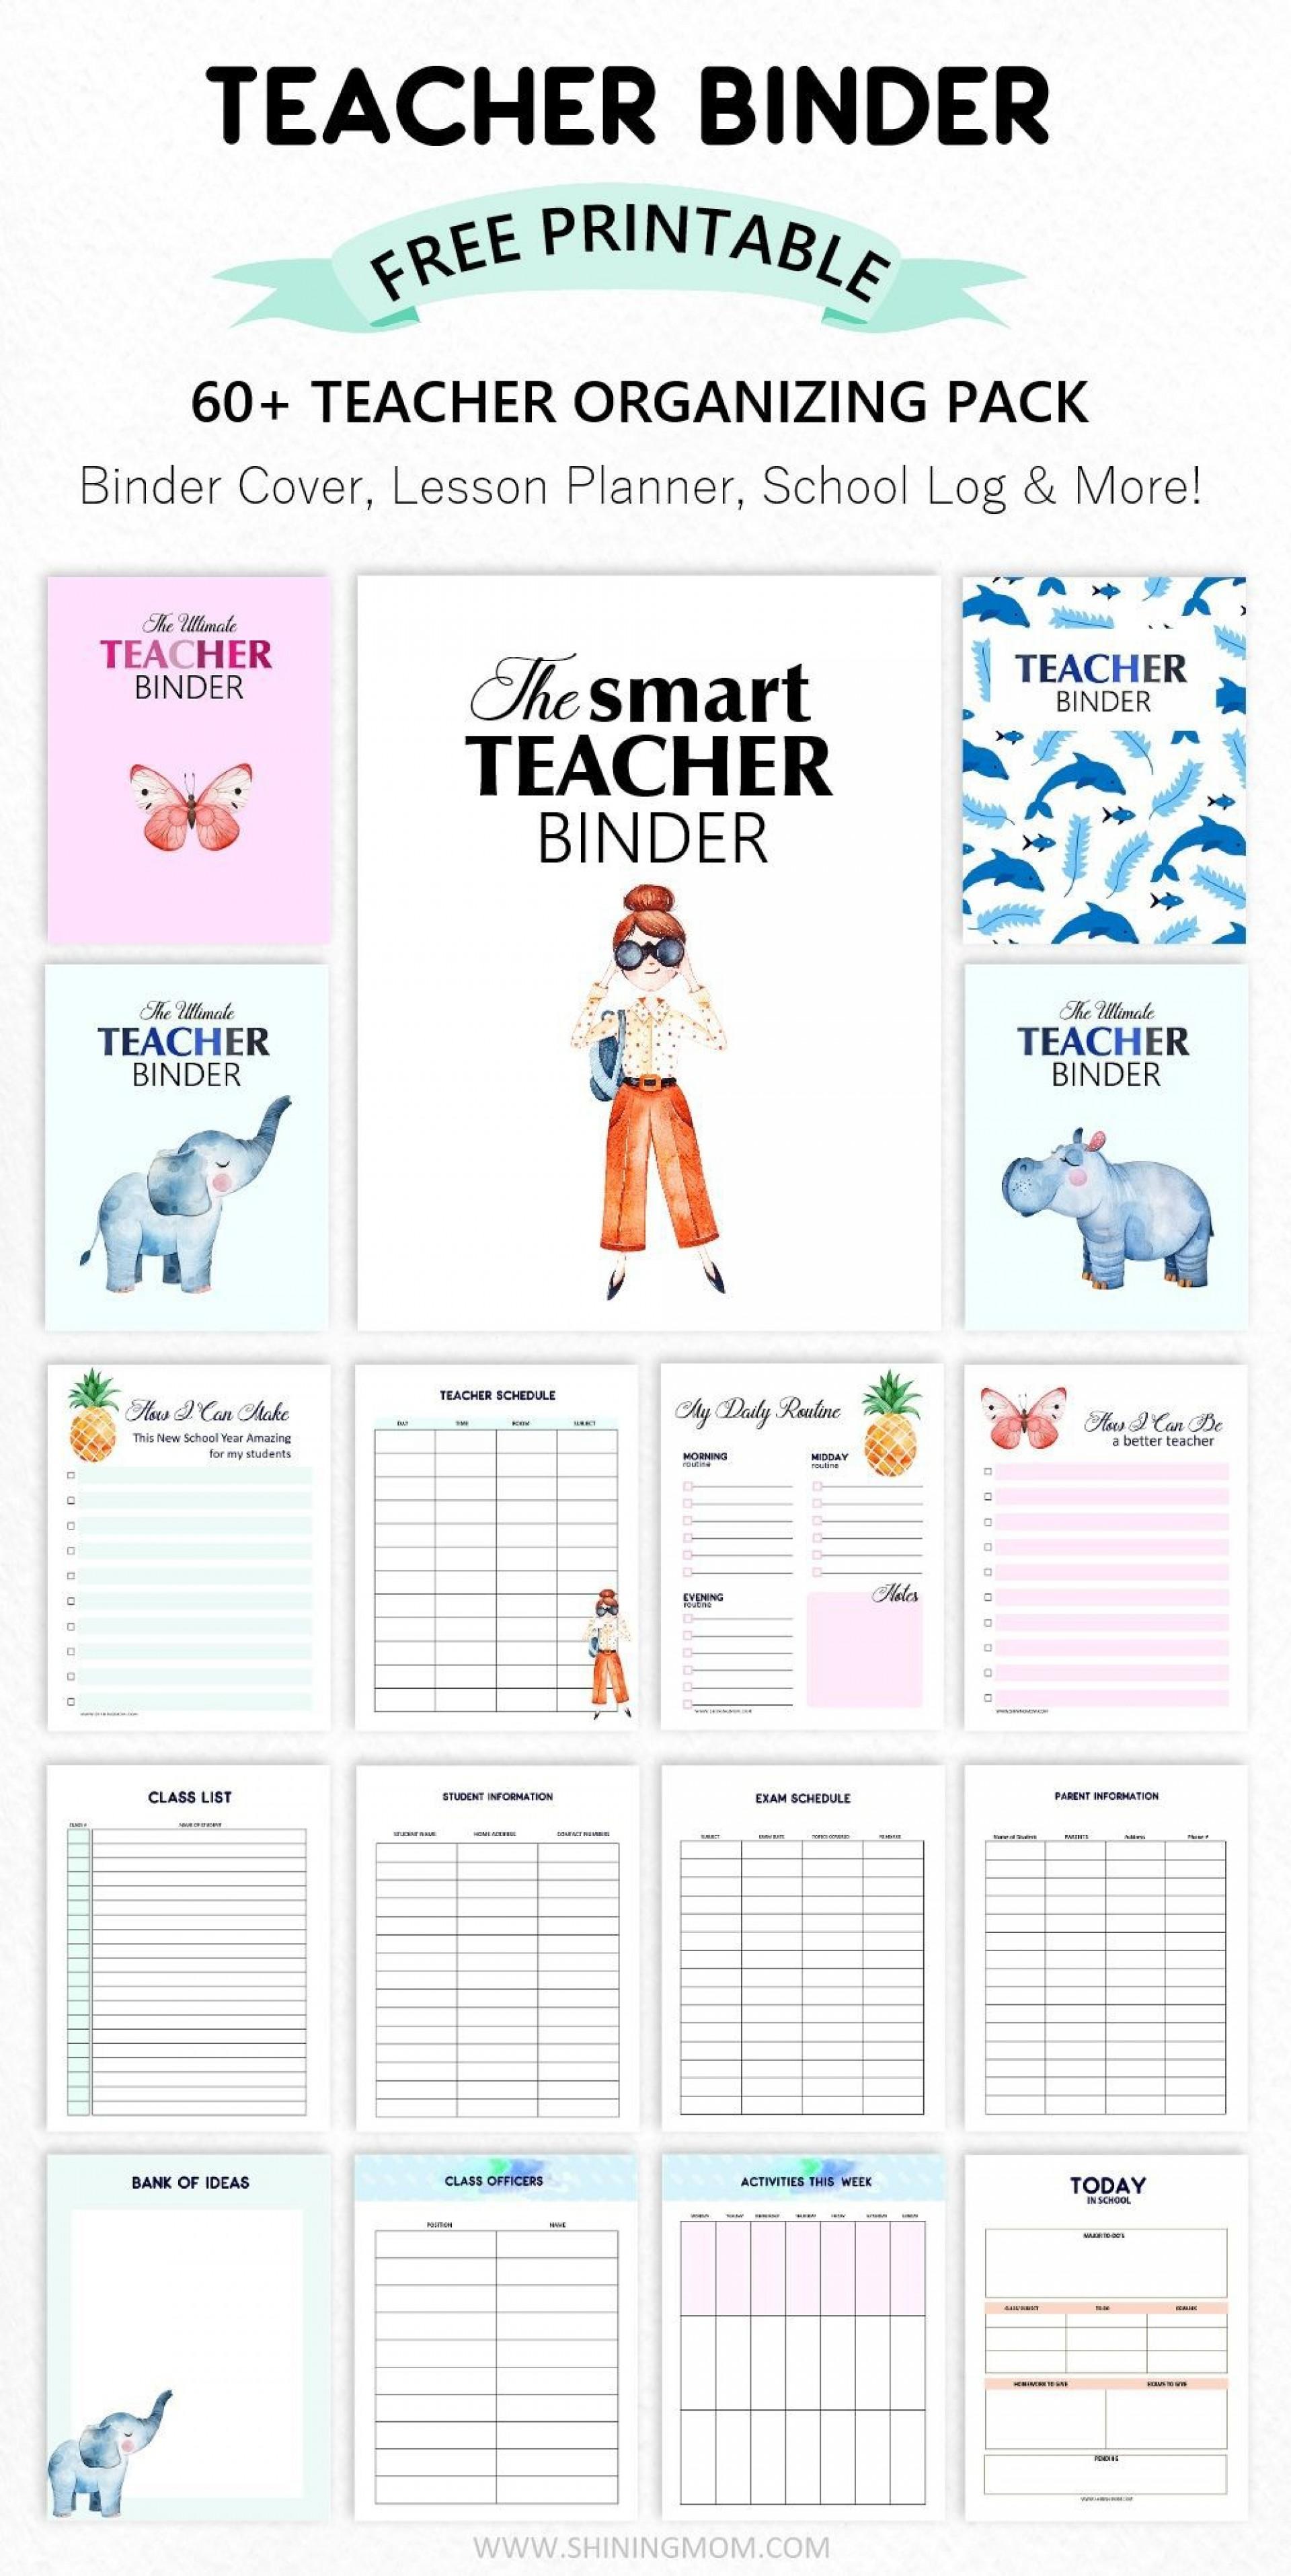 003 Formidable Free Printable Teacher Binder Template High Resolution  Templates1920